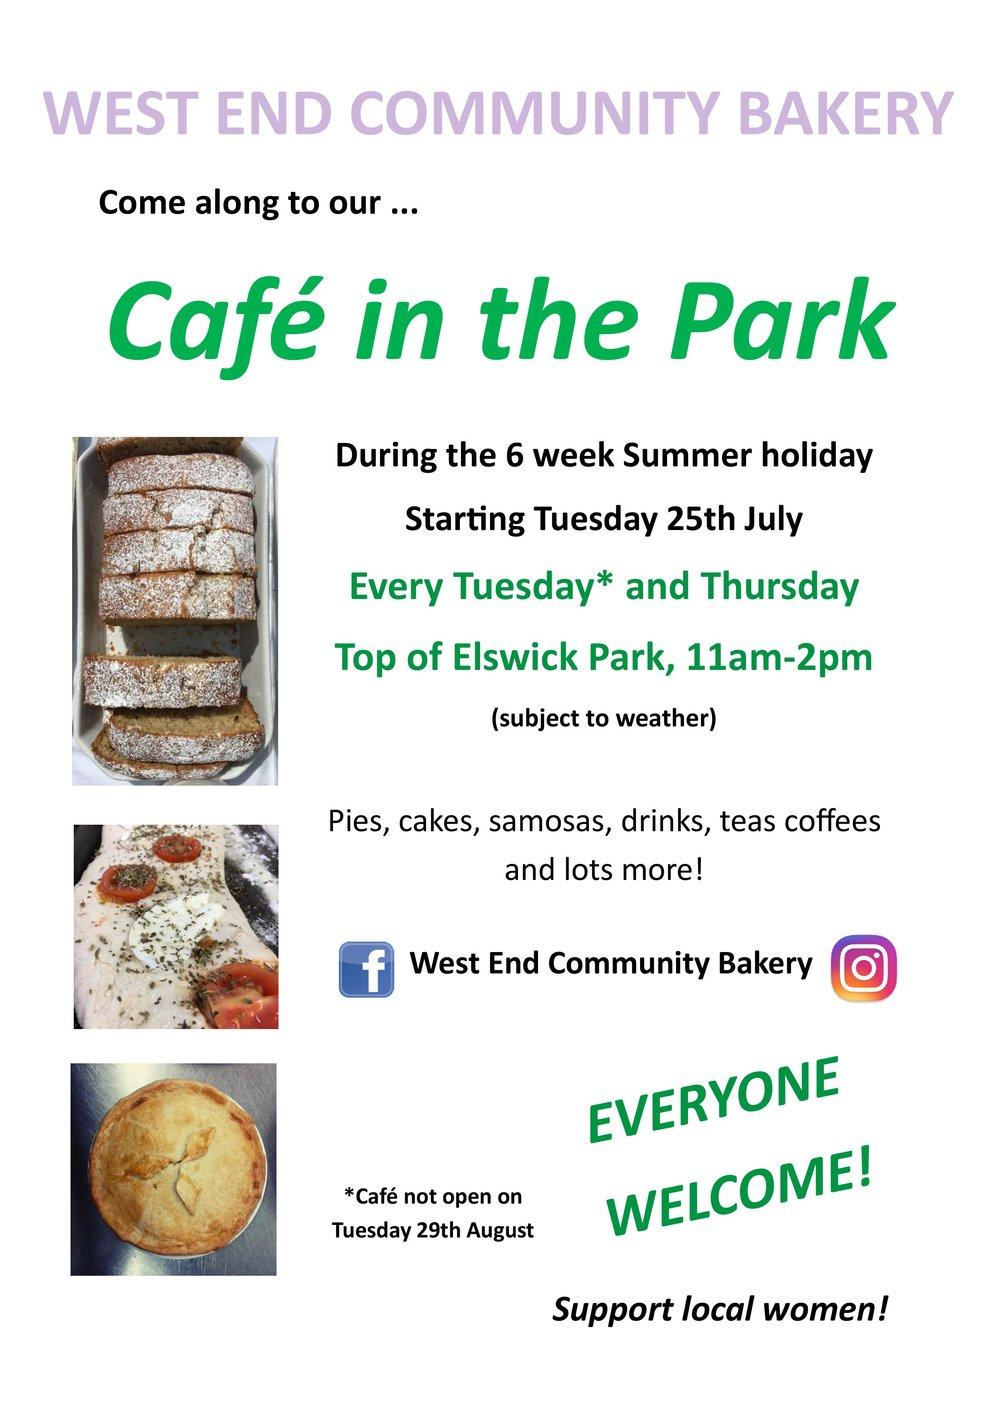 Cafe in the Park flyer Jun 2017 FINAL.jpg